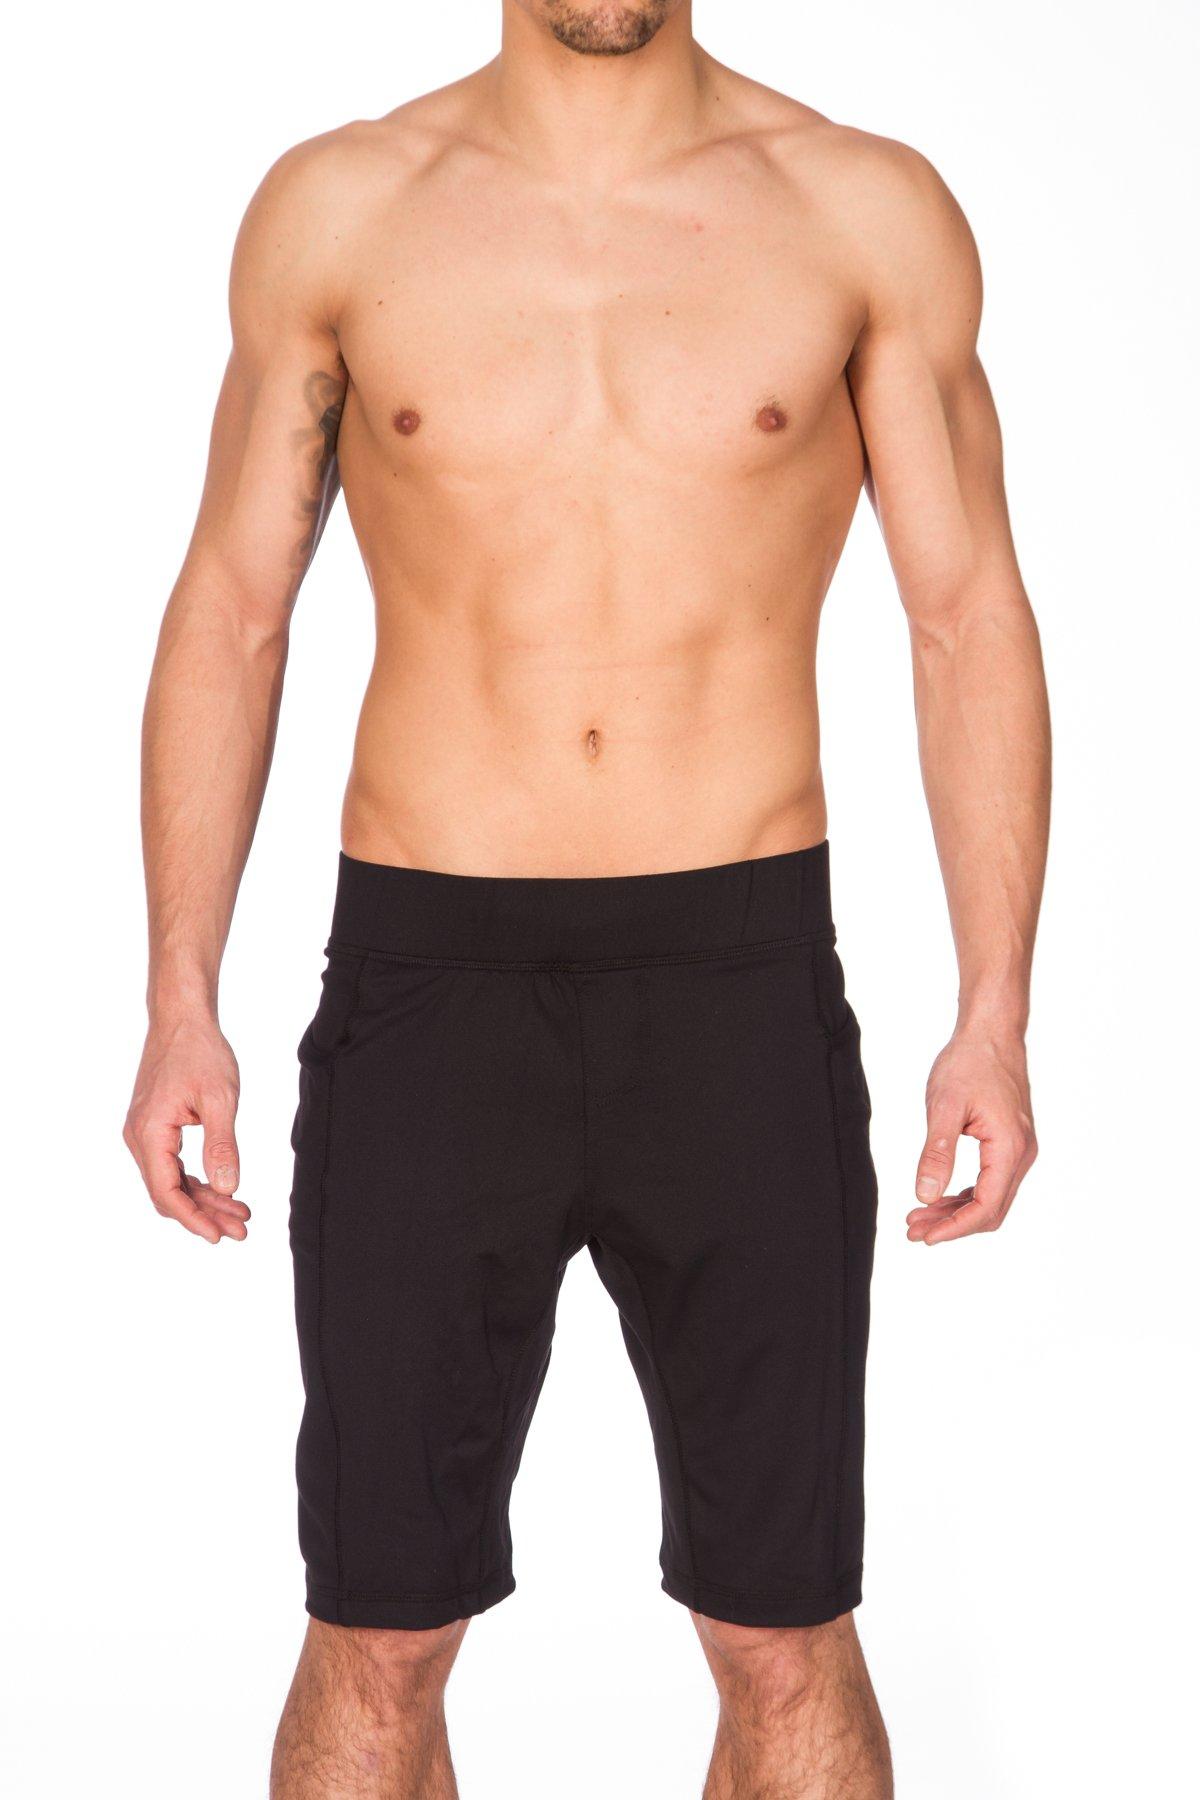 Gary Majdell Sport Men's Quick Drying Active Yoga Short